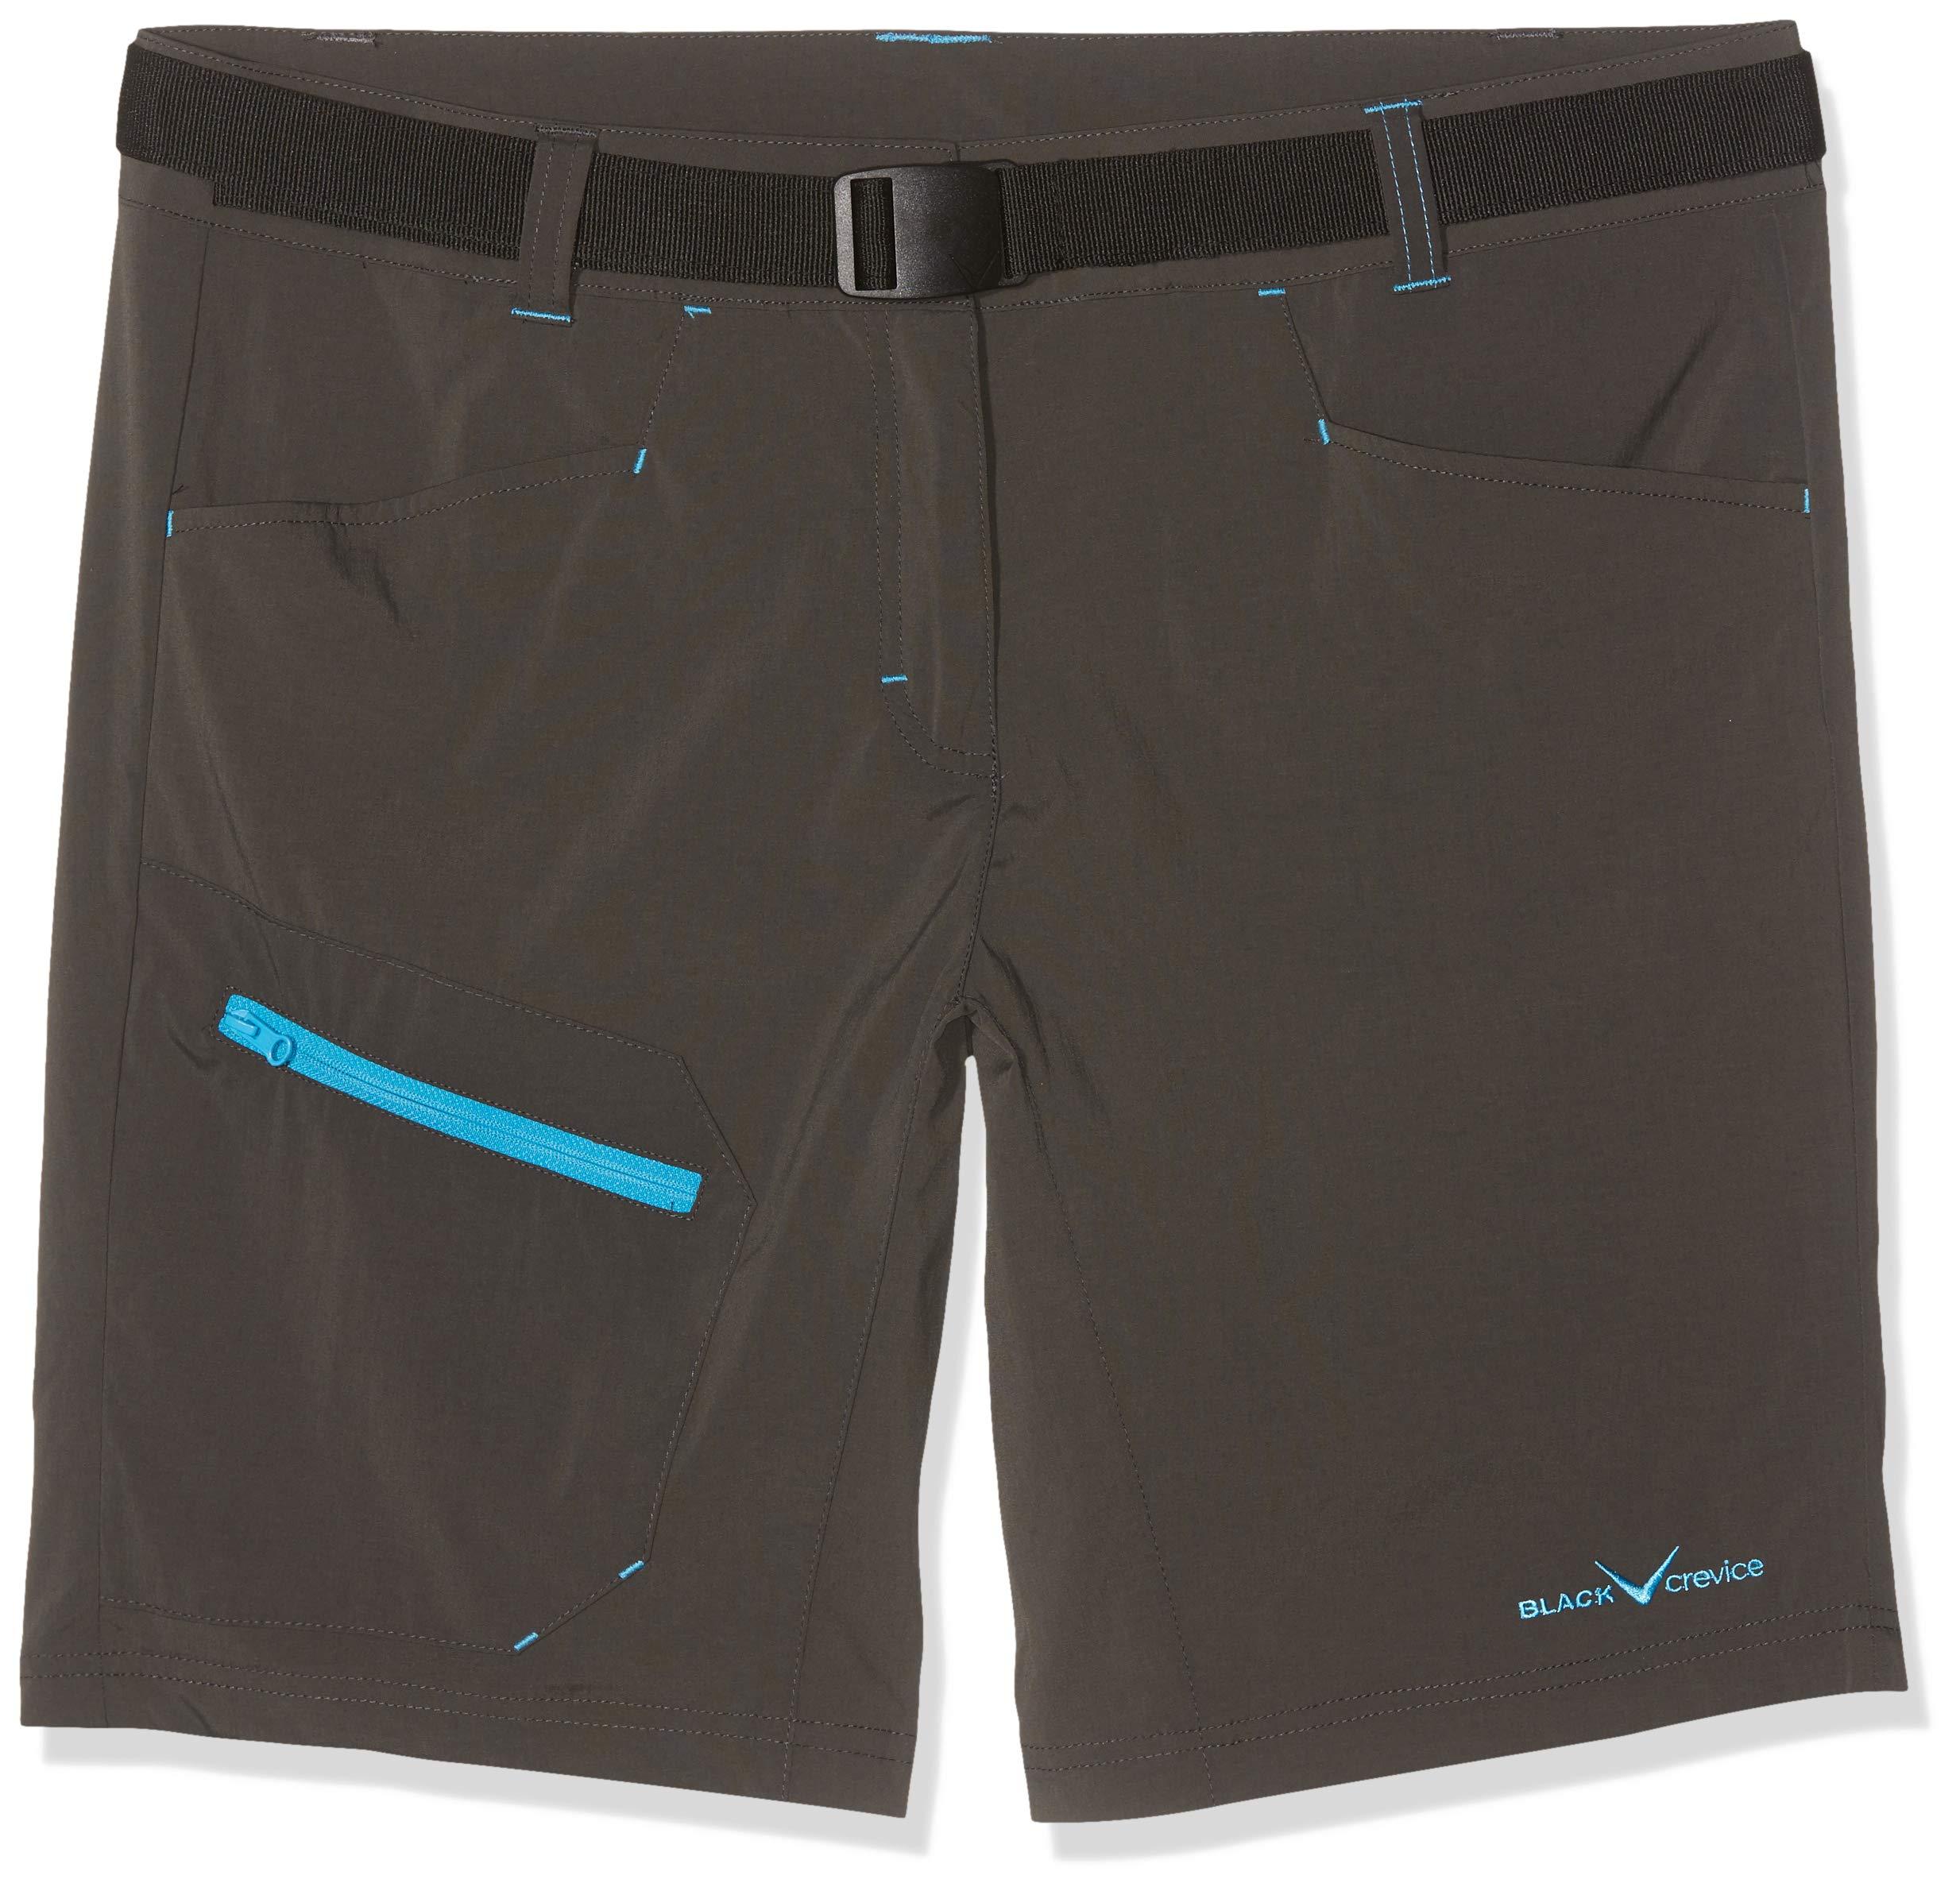 Black Crevice Damen Trekking Shorts, anthrazit, 44